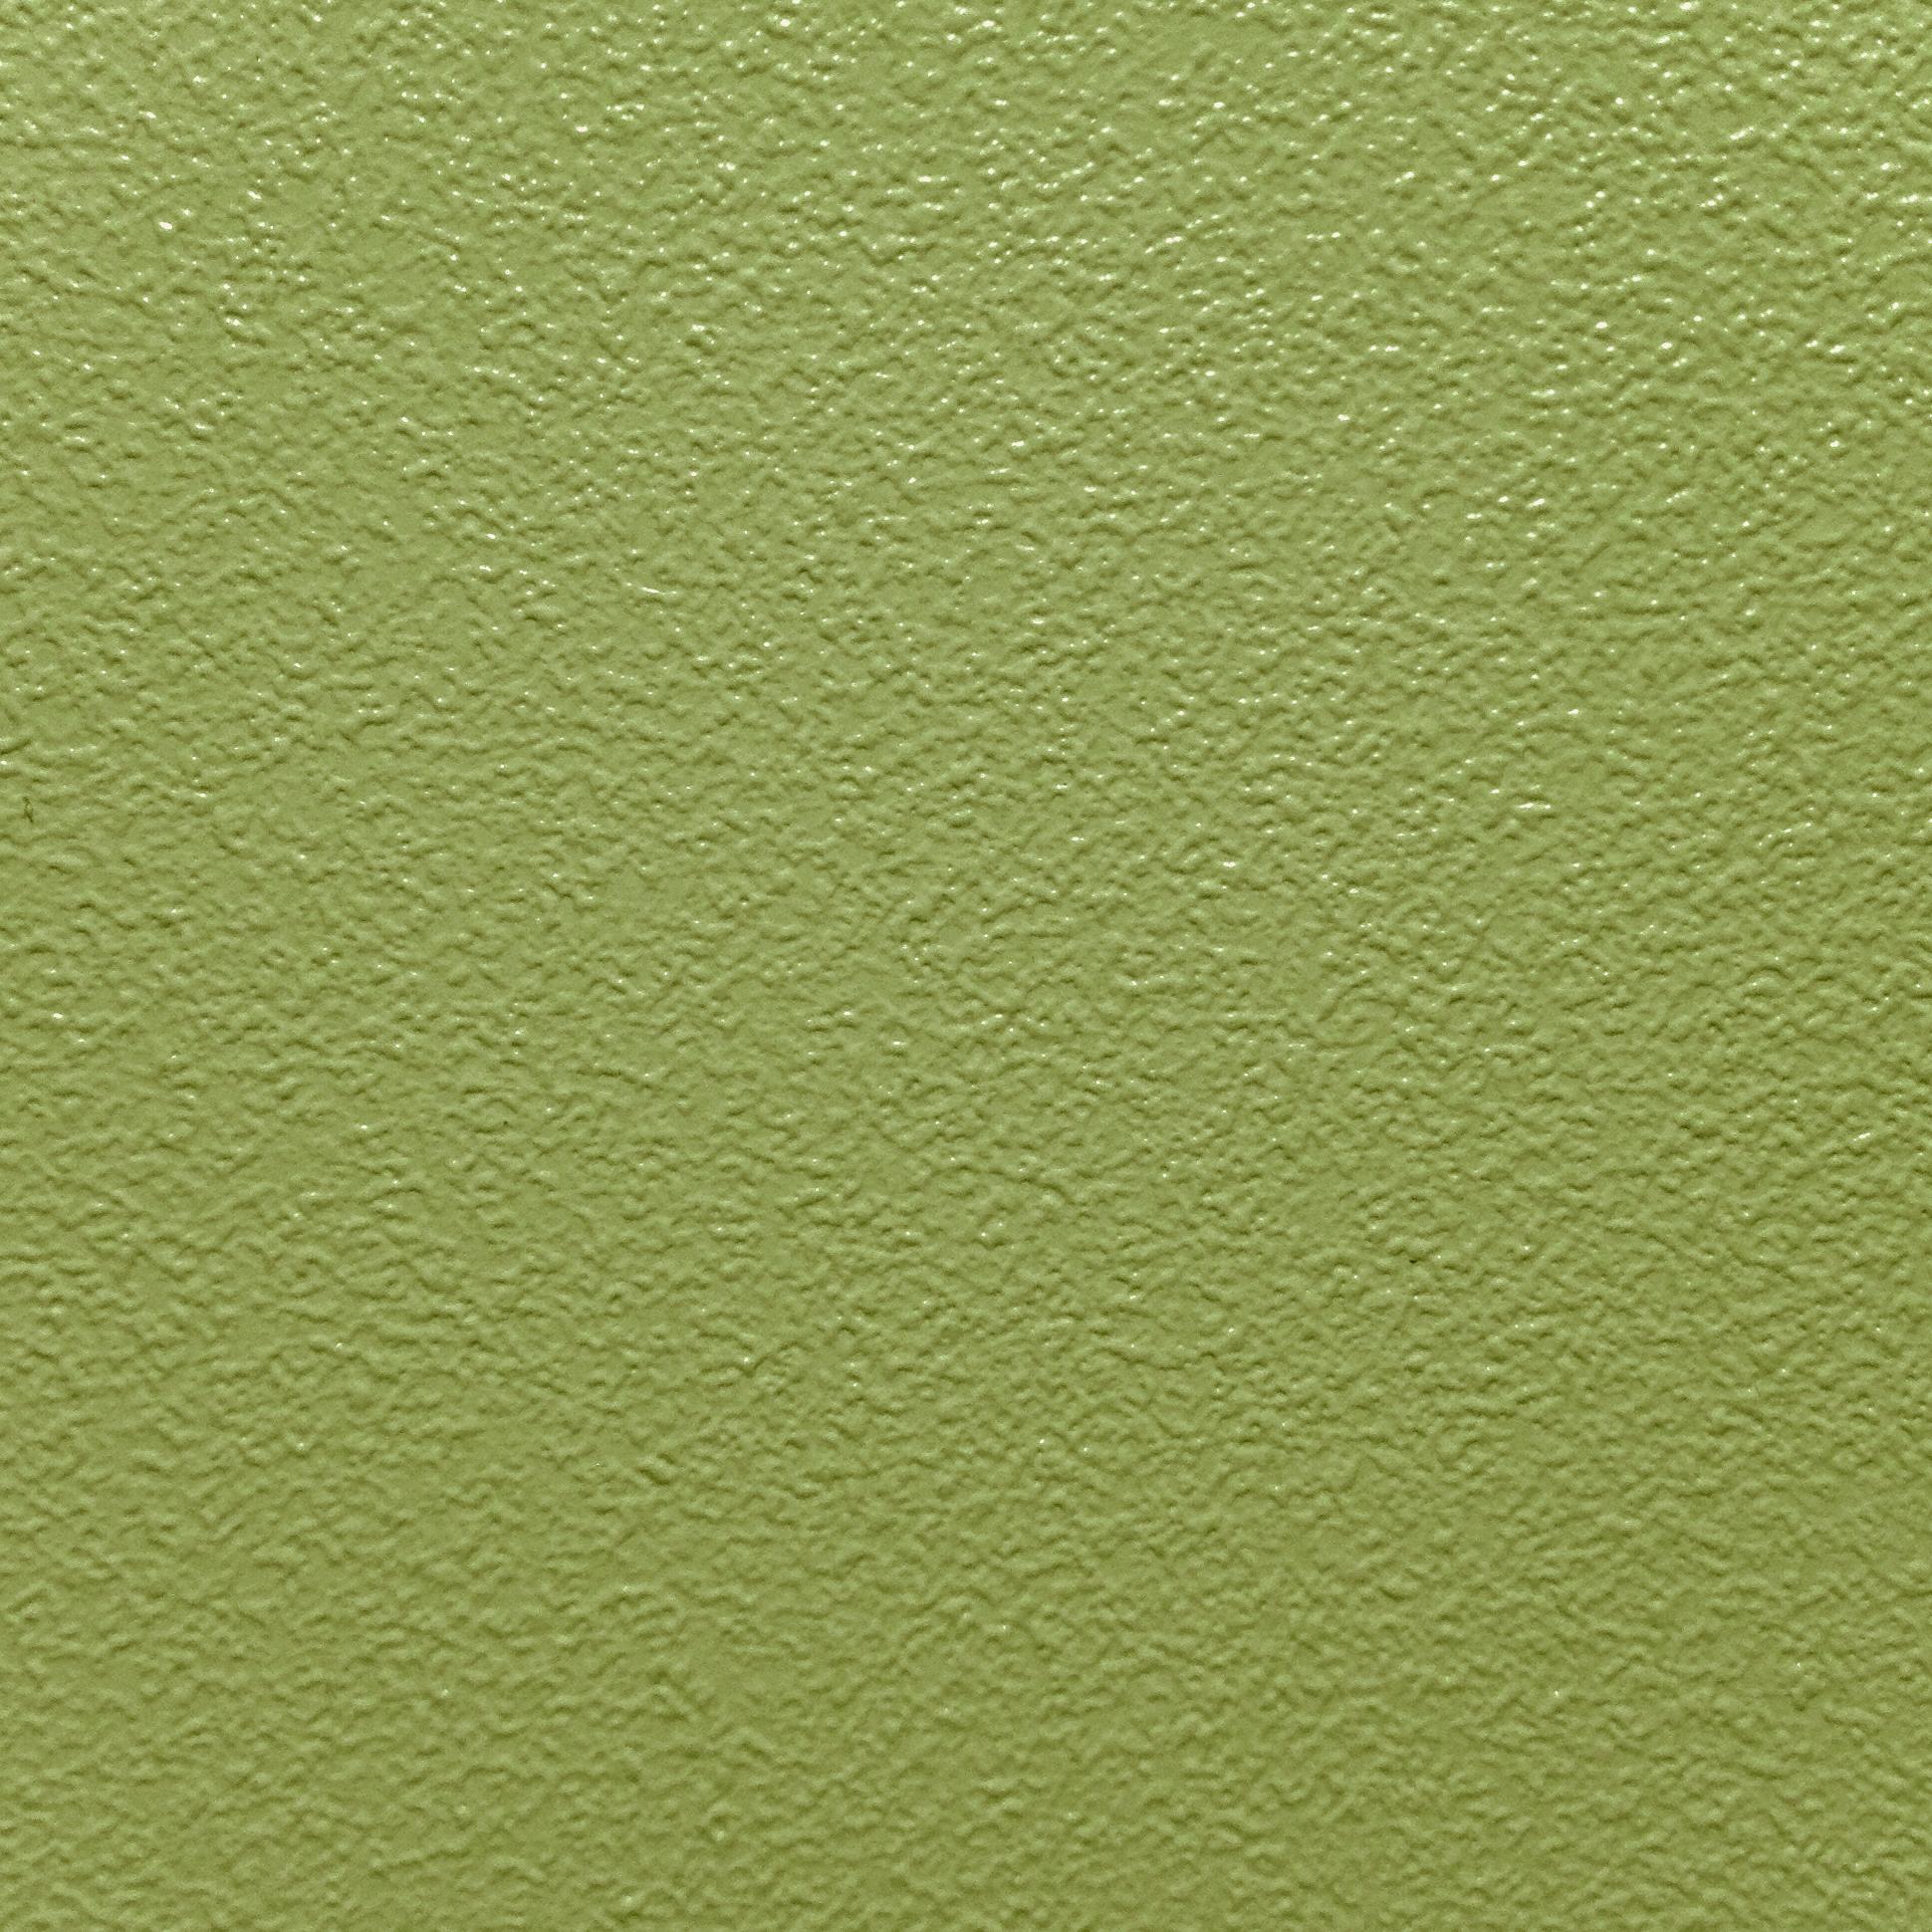 Green (003)